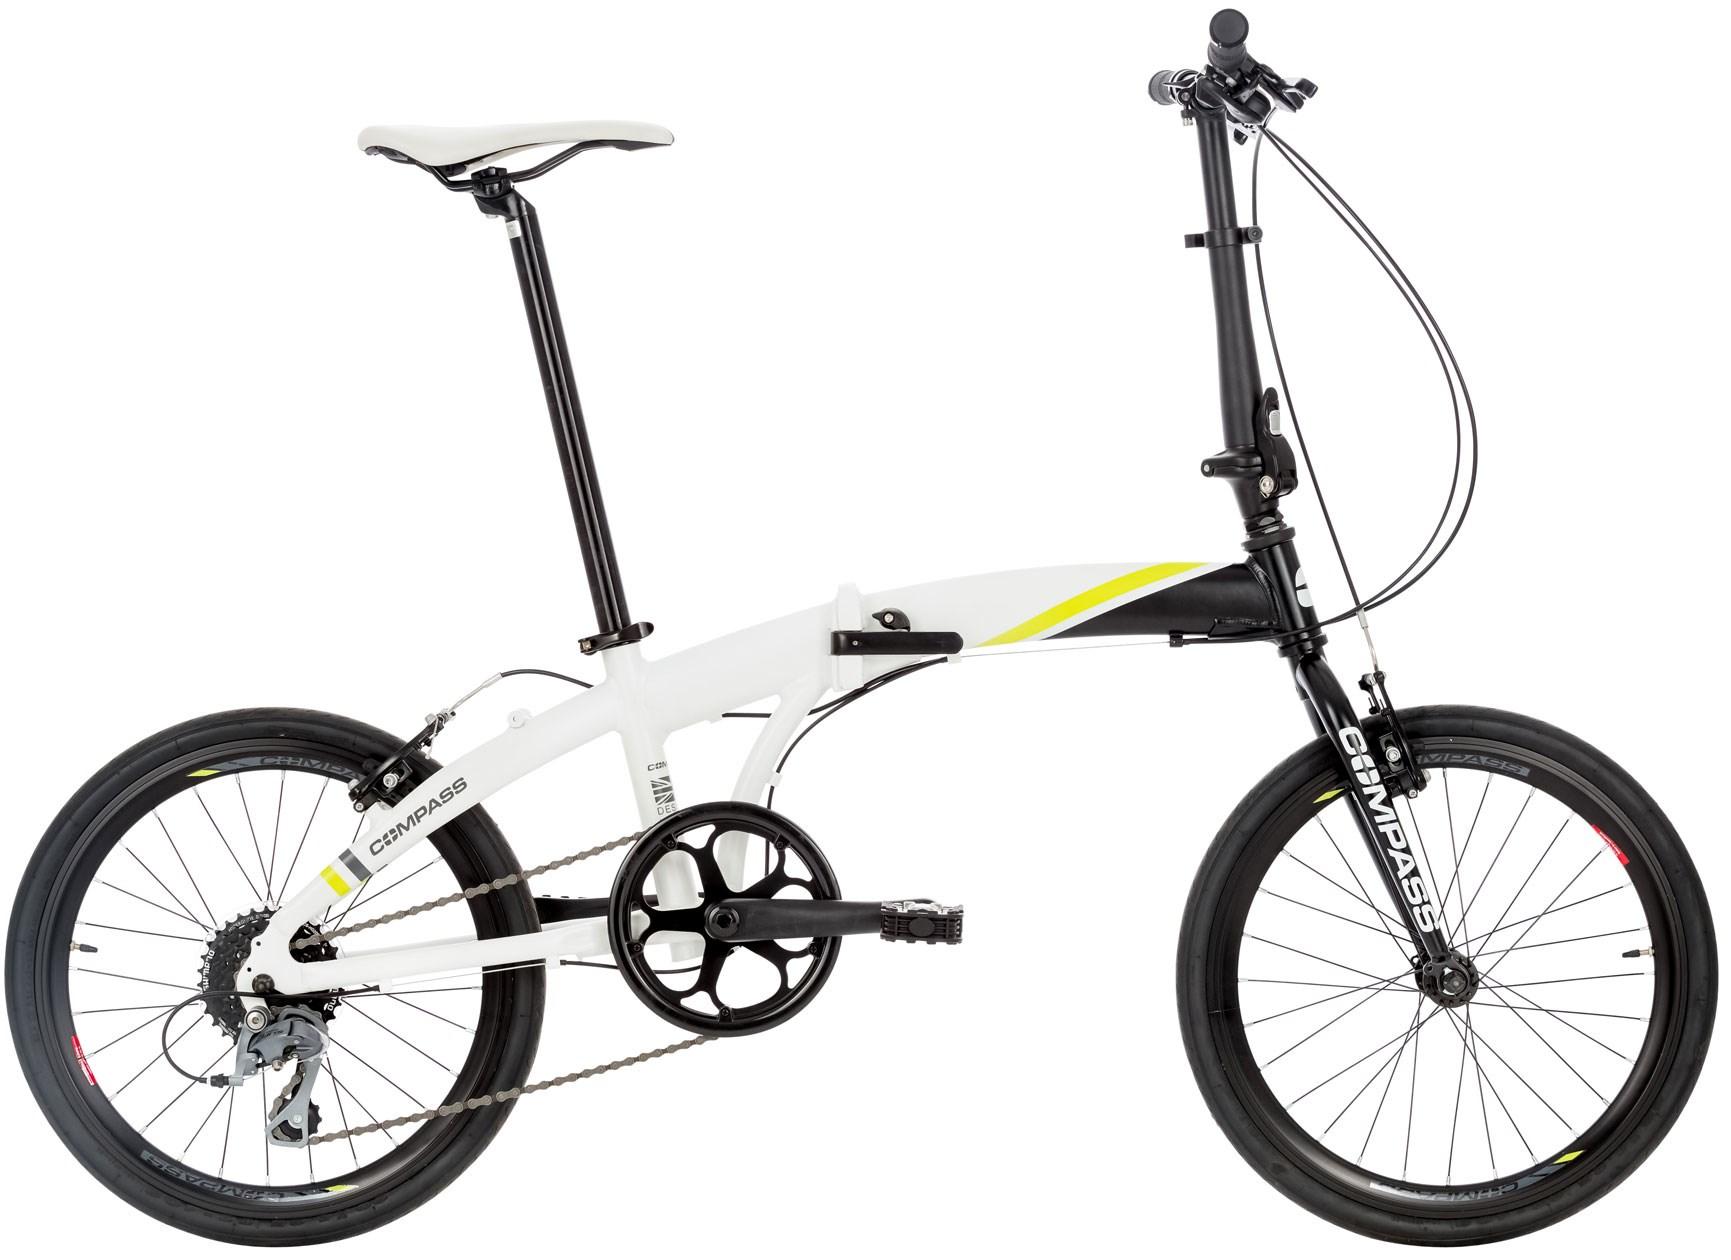 Compass Fast Forward Folding Bike £239.20 @ Go Outdoors